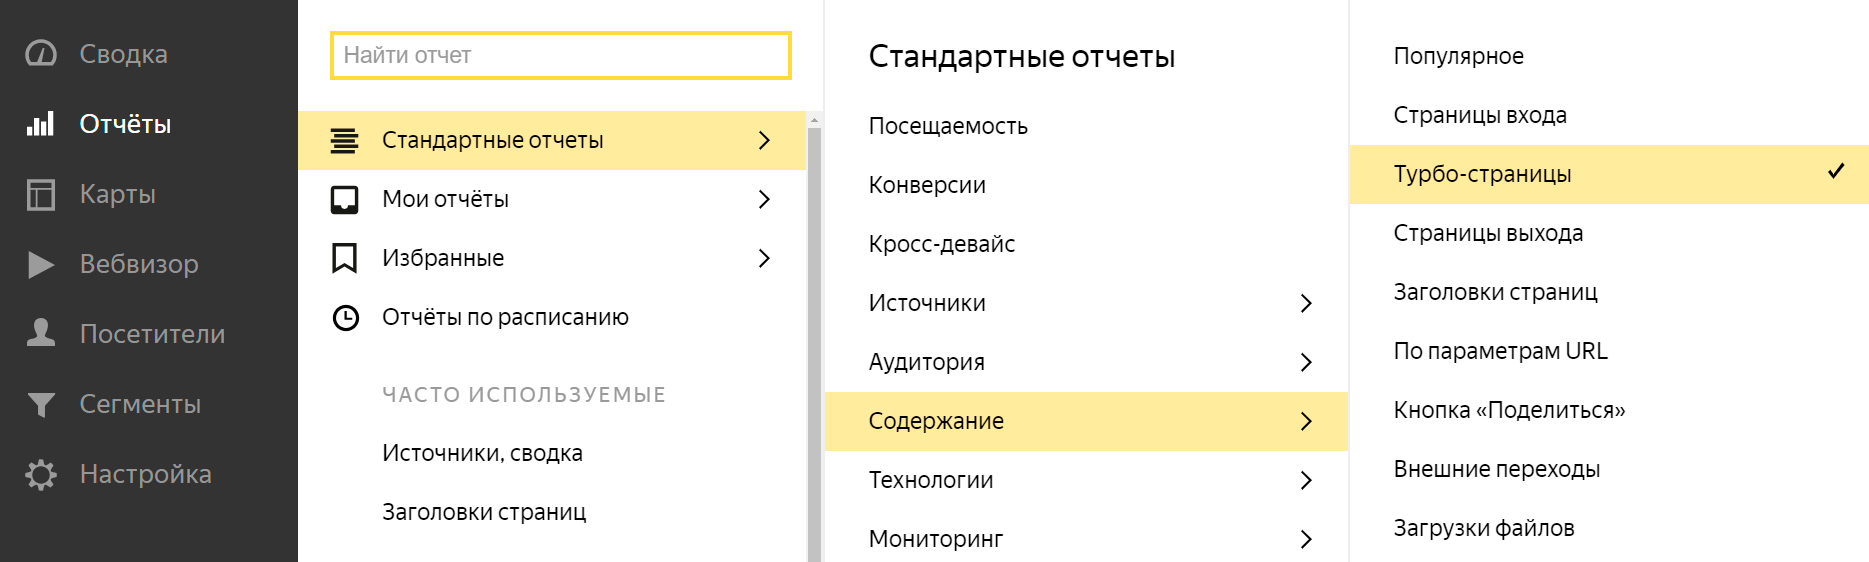 Яндекс.Метрика добавила отчет по Турбо-страницам